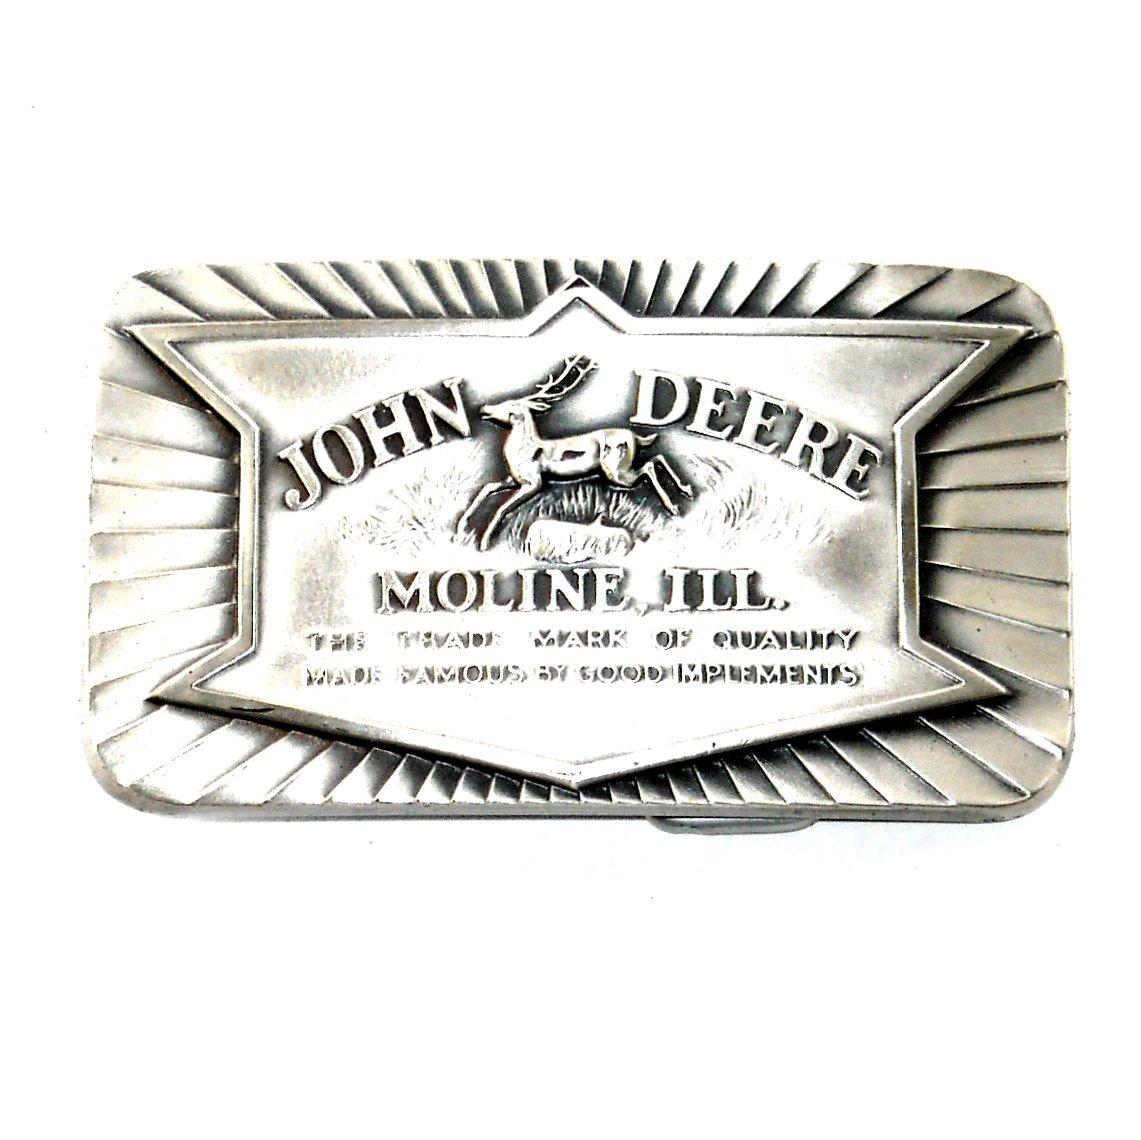 John Deere Historical Trademark 1984 Pewter Belt Buckle